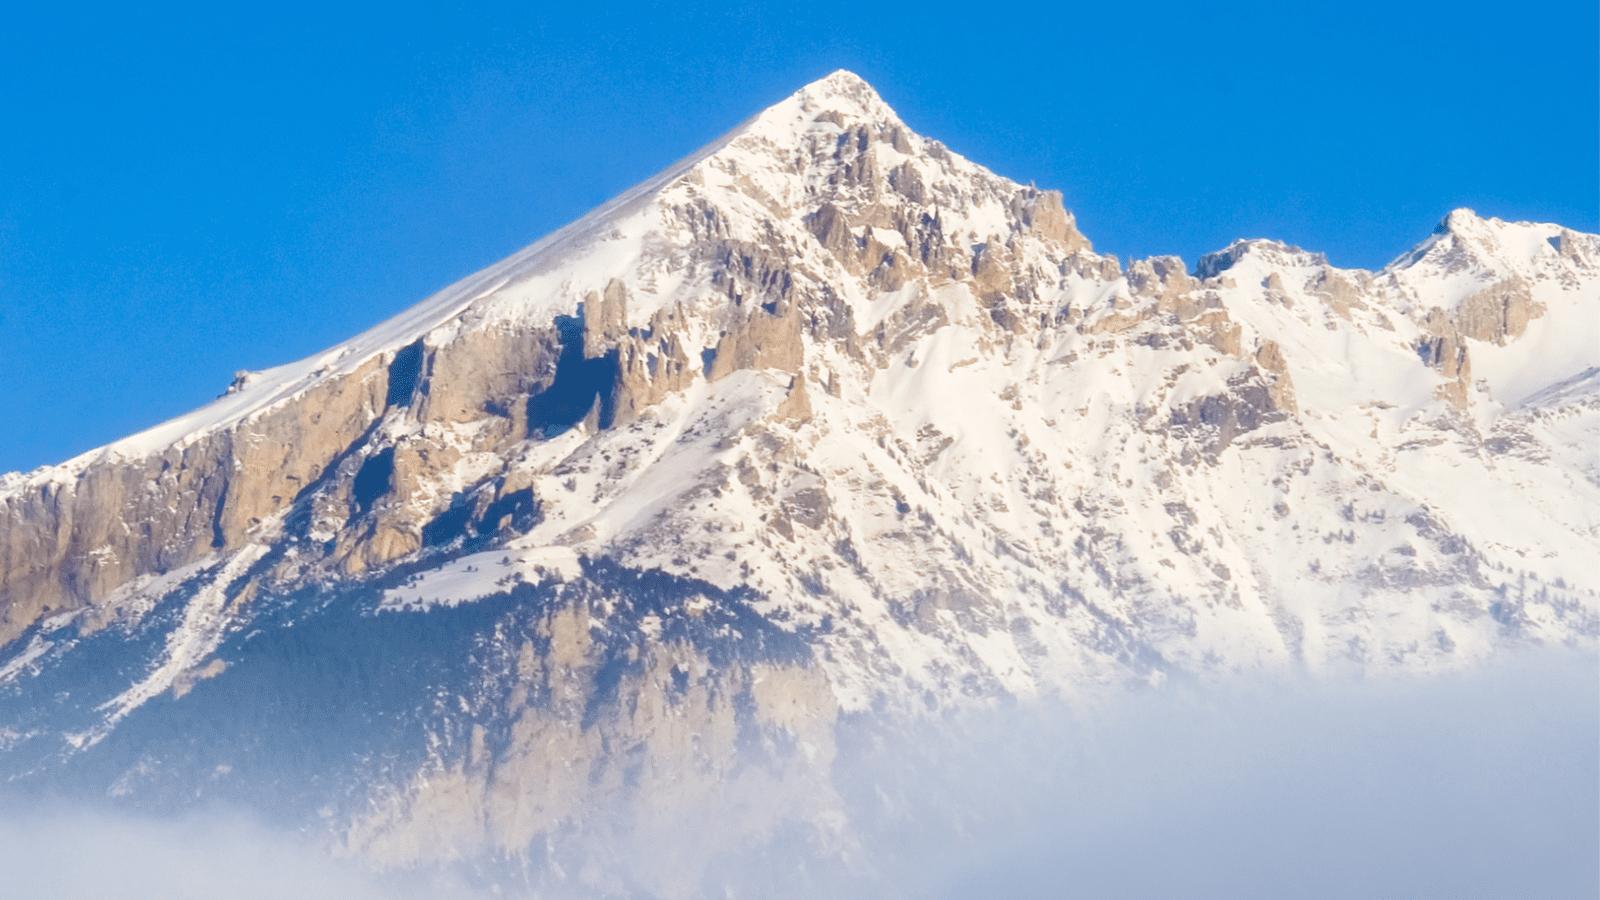 sauze d'oulx airport transfers - ski lifts